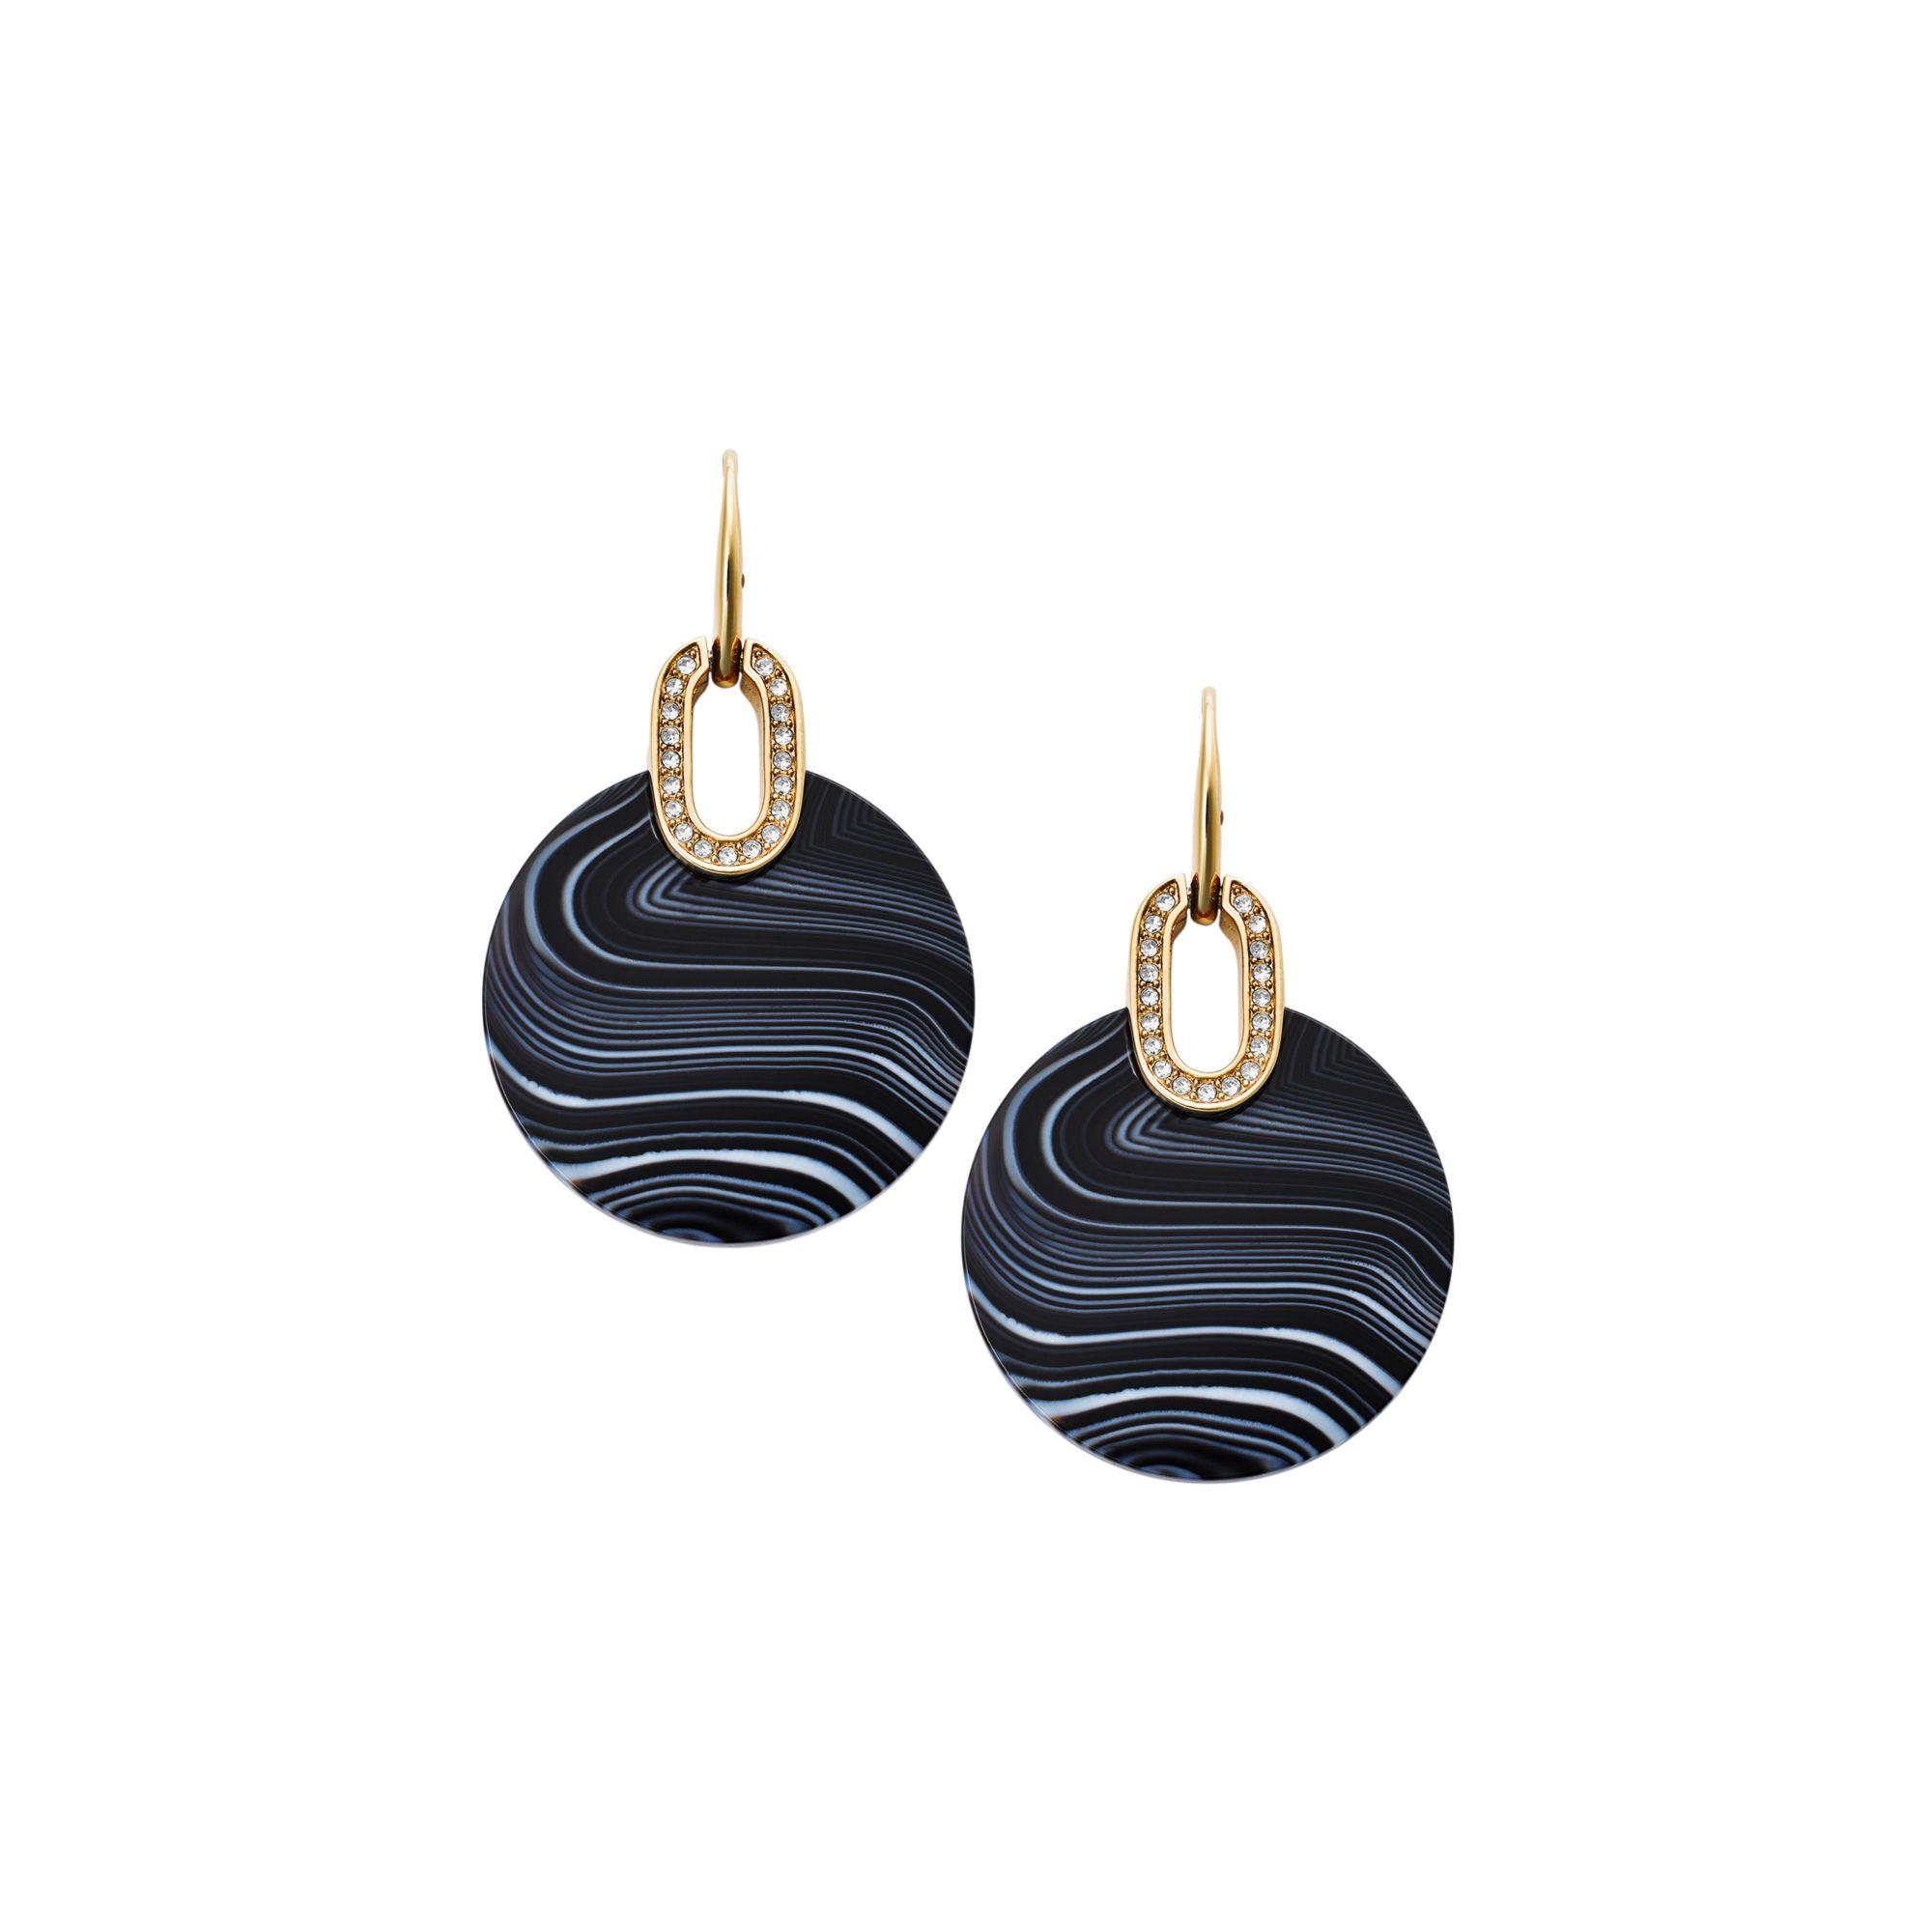 b9c97ed4c8ec Lyst - Michael Kors Gold-tone Black Agate Disc Drop Earrings in Metallic